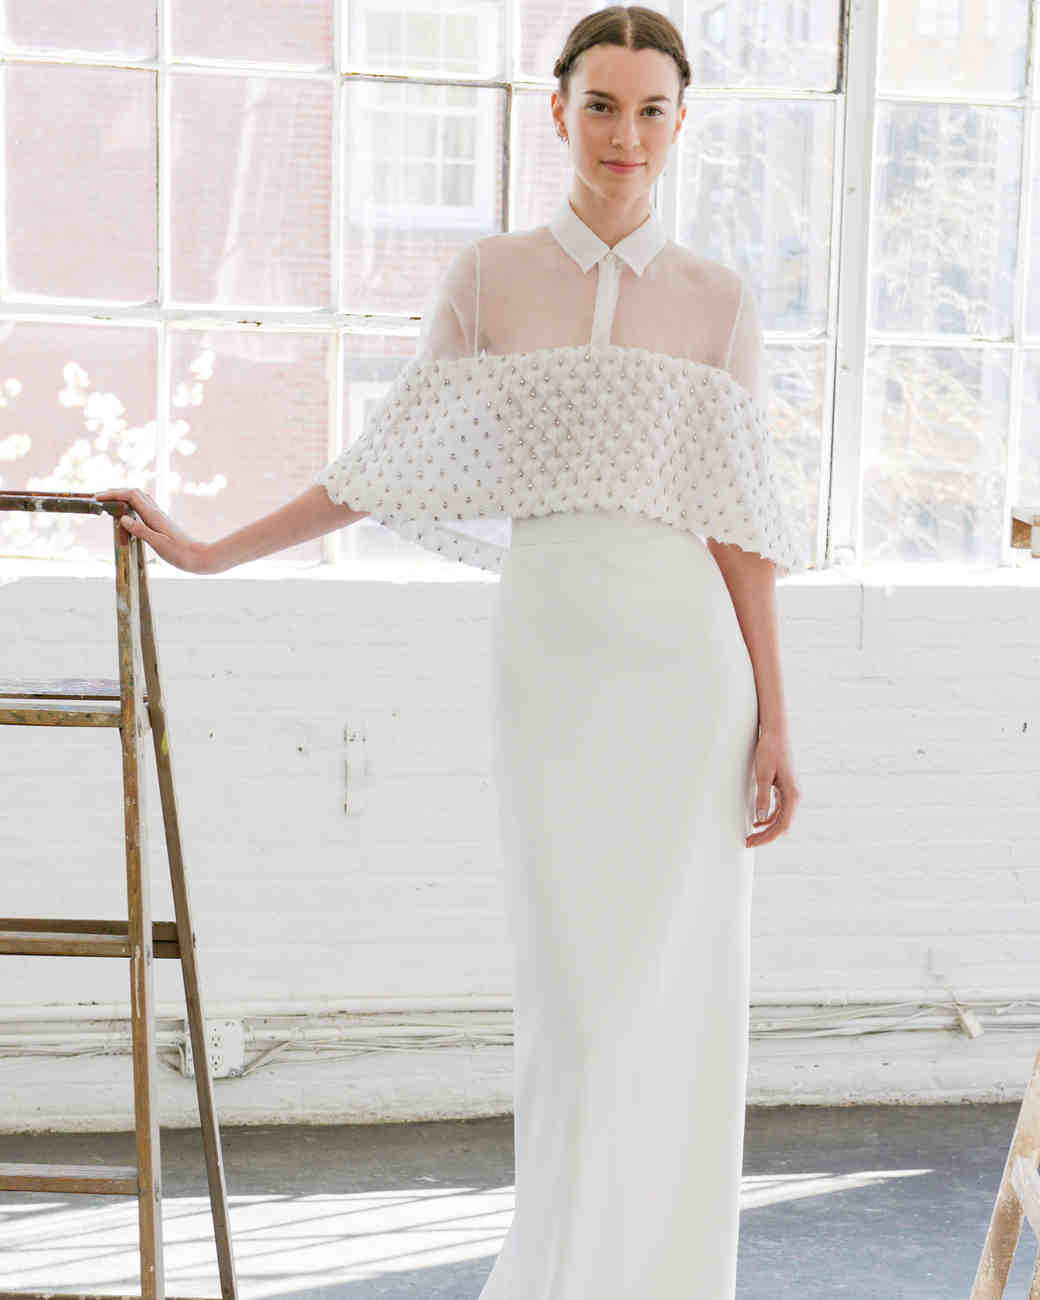 Lela Rose Bridal Wedding Dress Collection Spring 2018: Lela Rose Spring 2017 Wedding Dress Collection